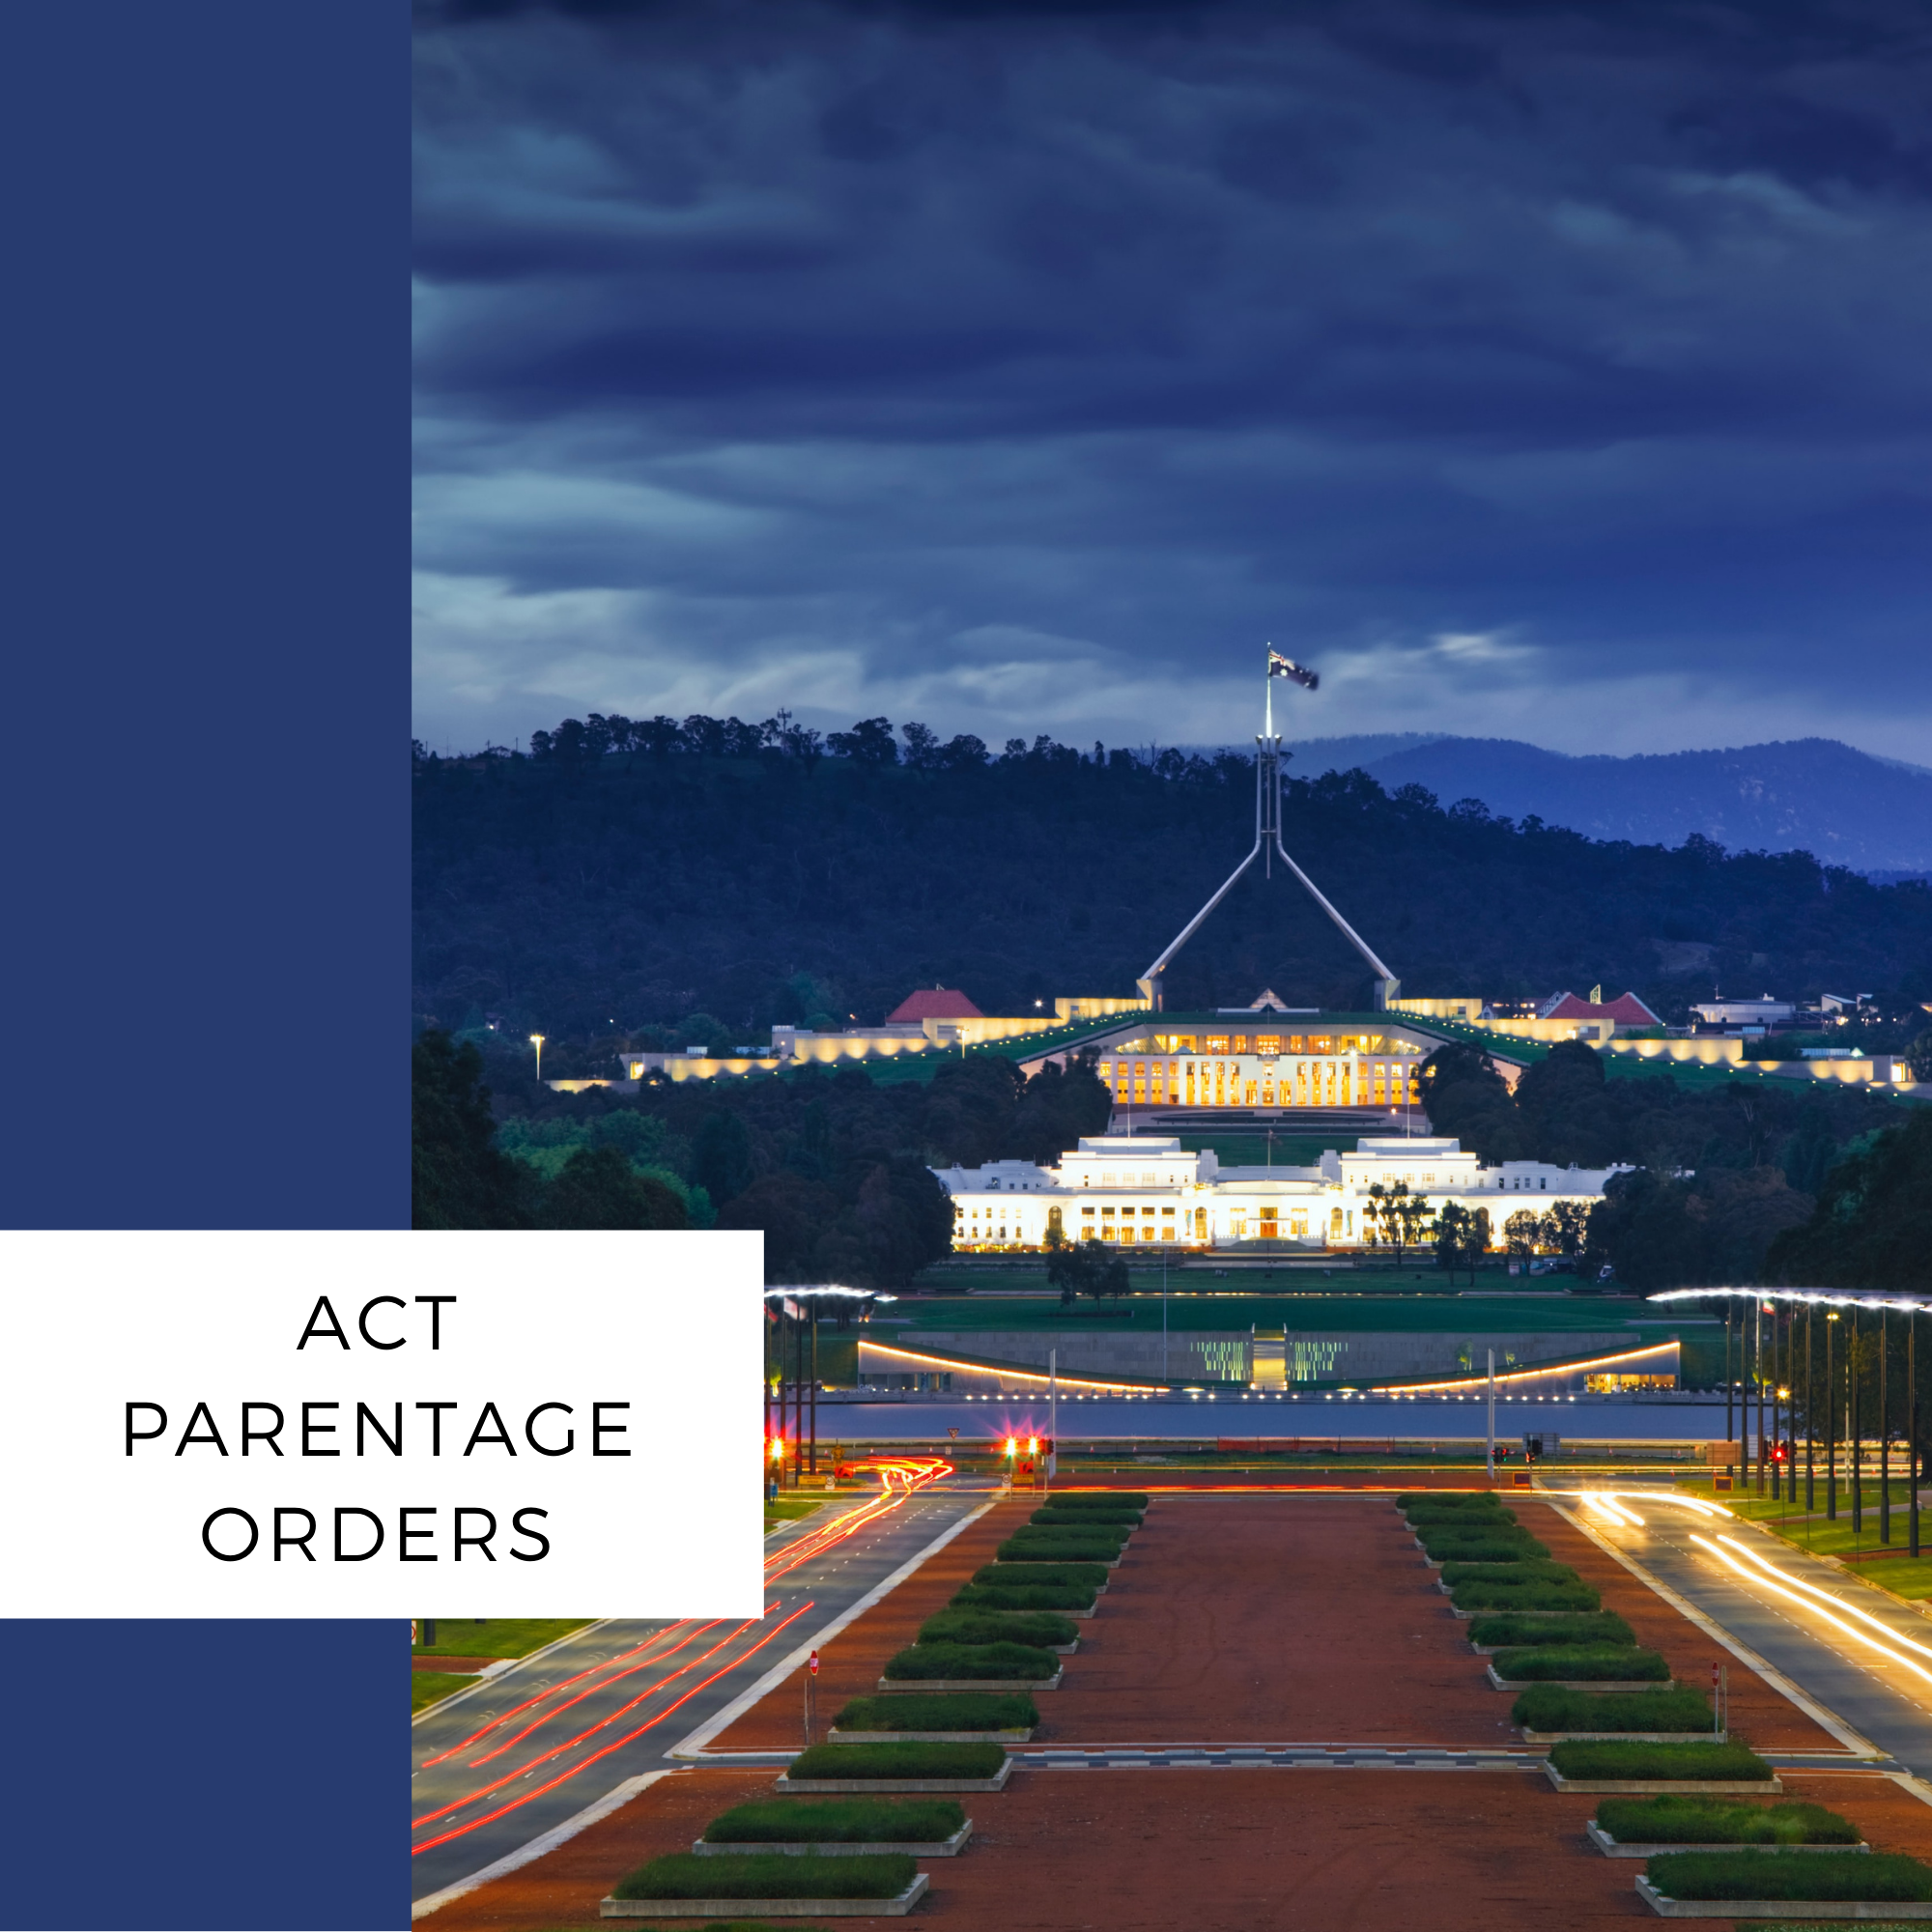 act parentage order